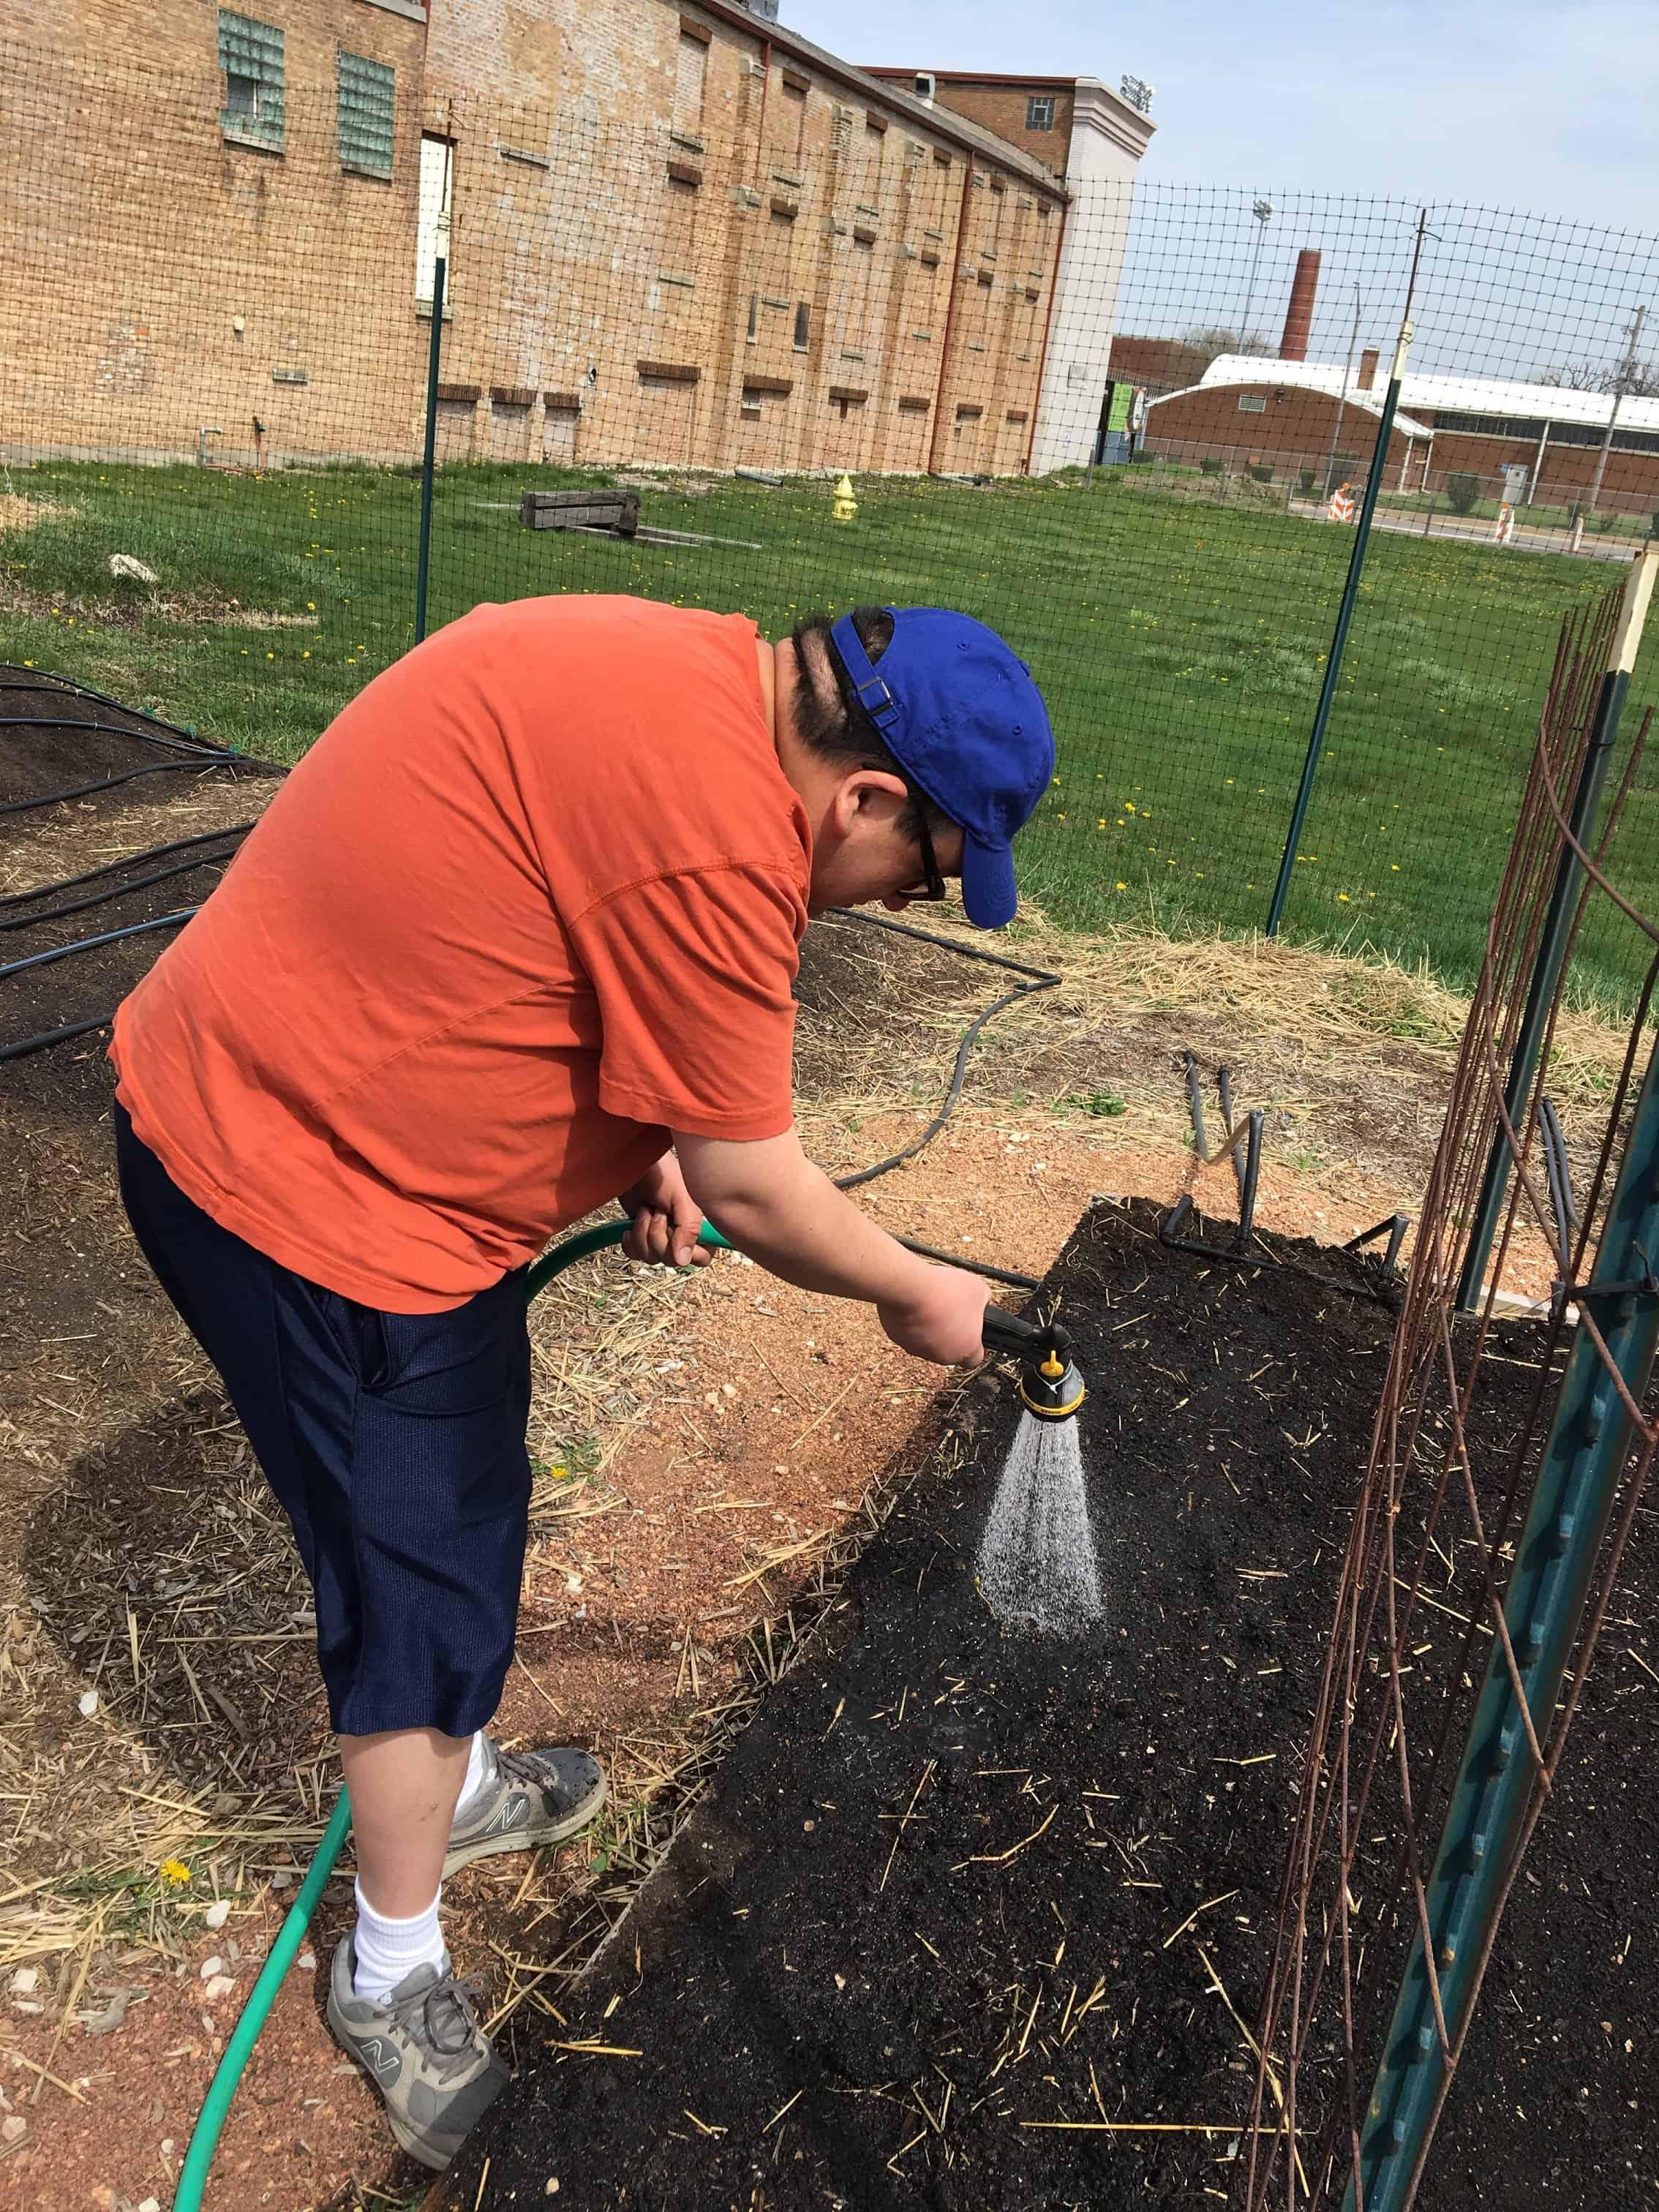 David watering his seeds